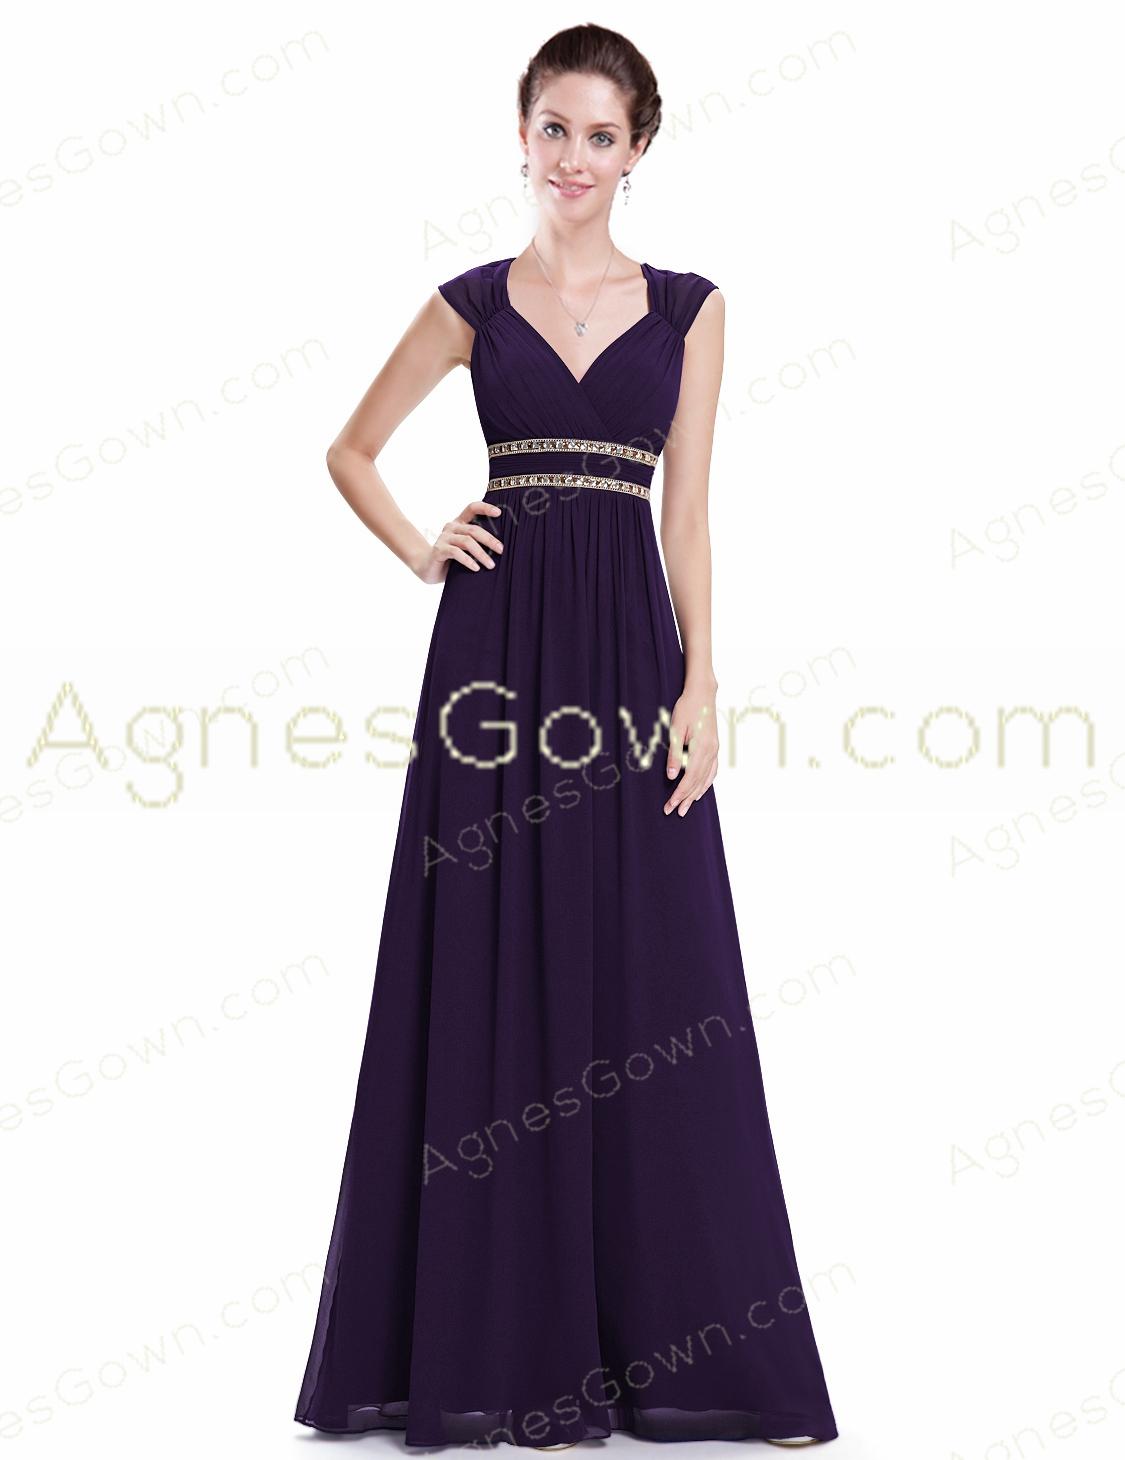 Eggplant Purple Long Prom Dress Keyhole Back